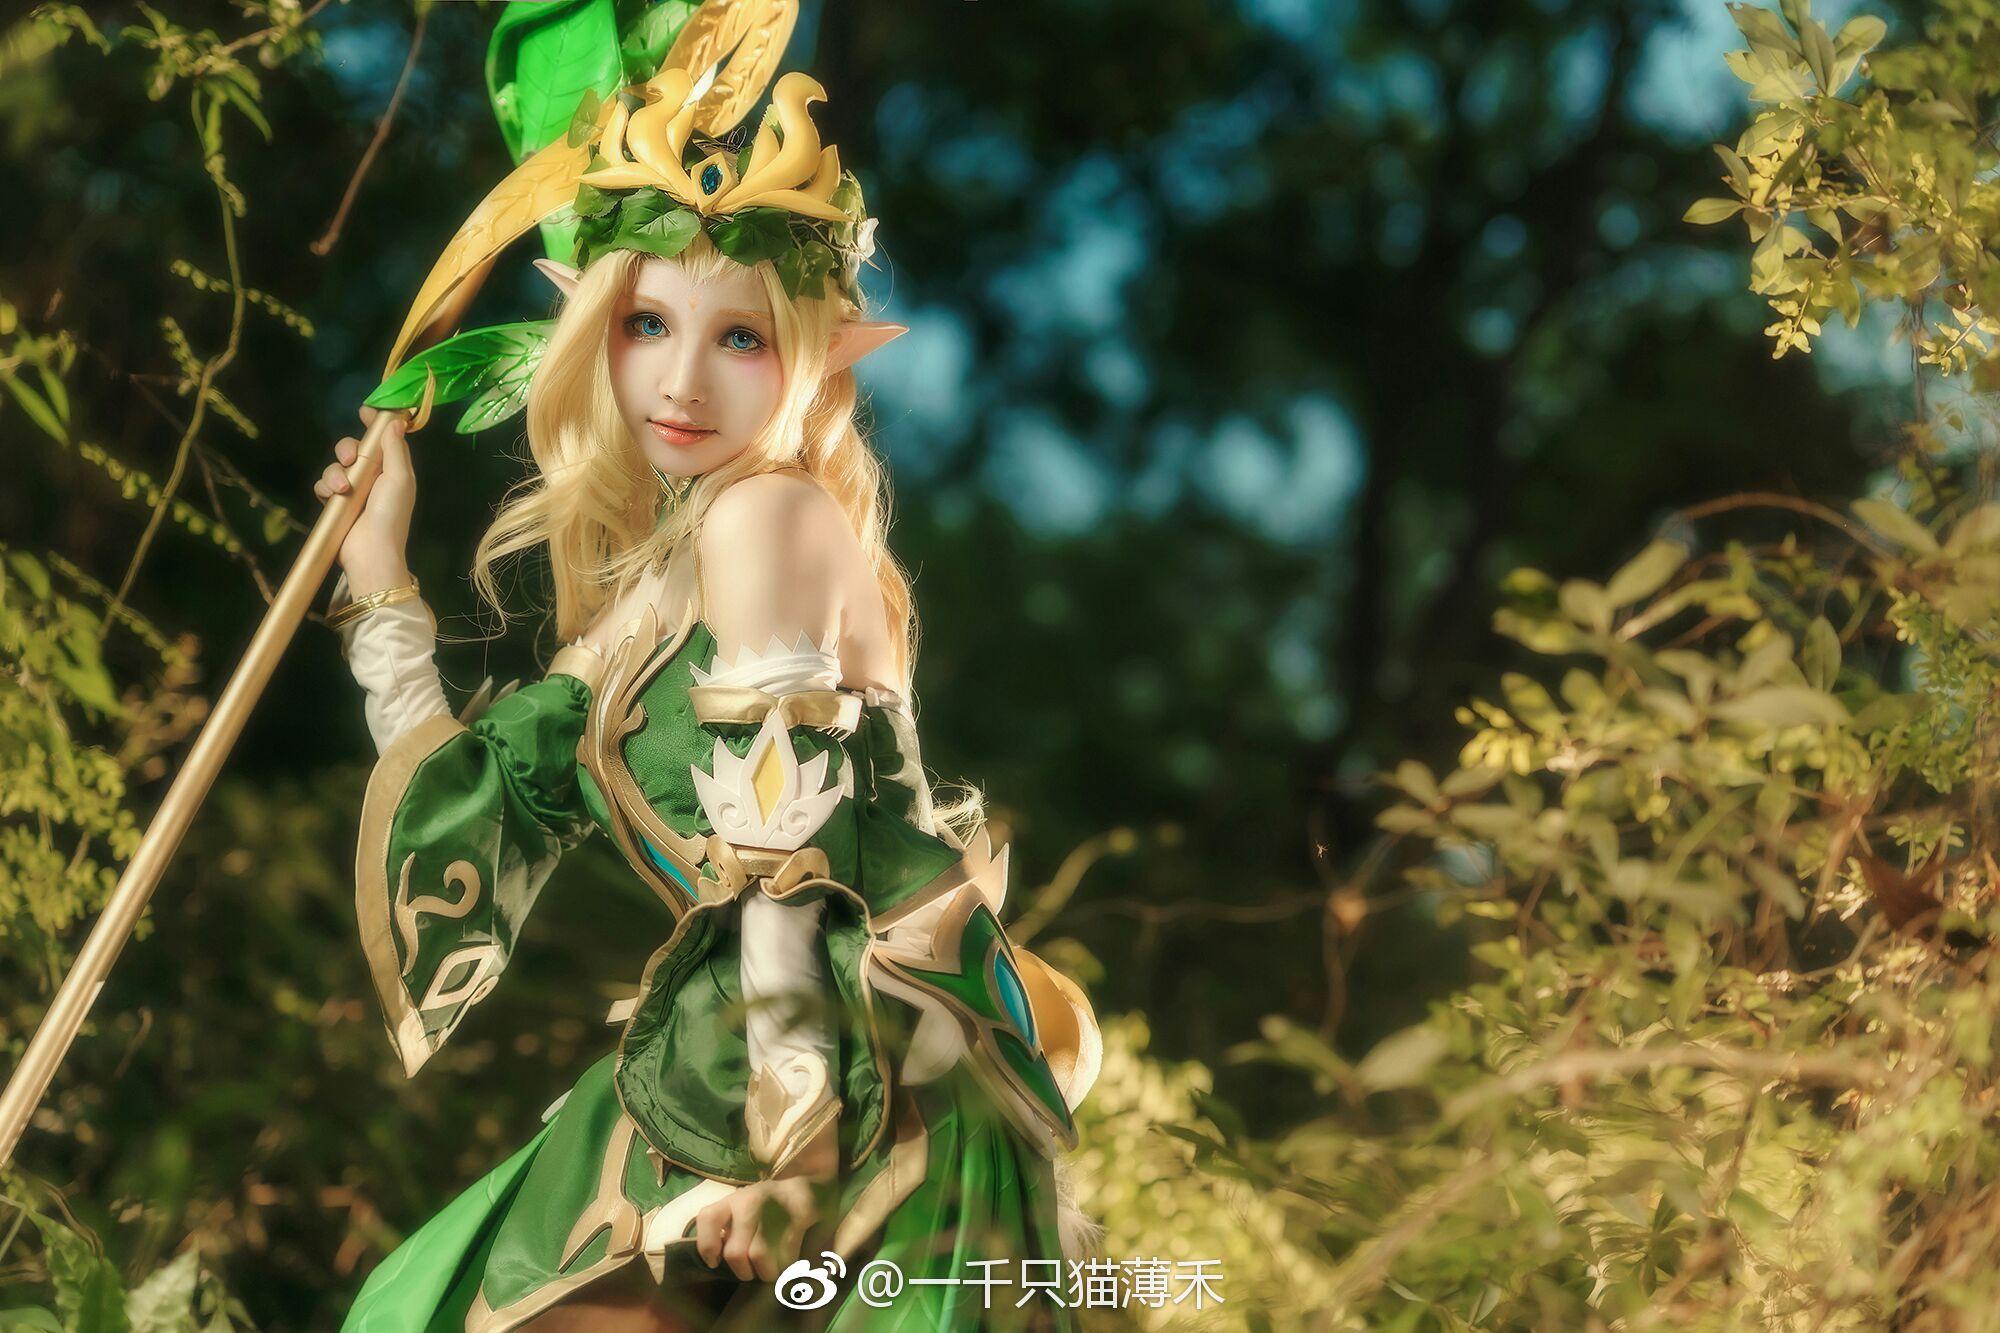 【cos正片】王者荣耀 王昭君精灵公主cos欣赏 cn:一千只猫薄禾 cosplay-第5张